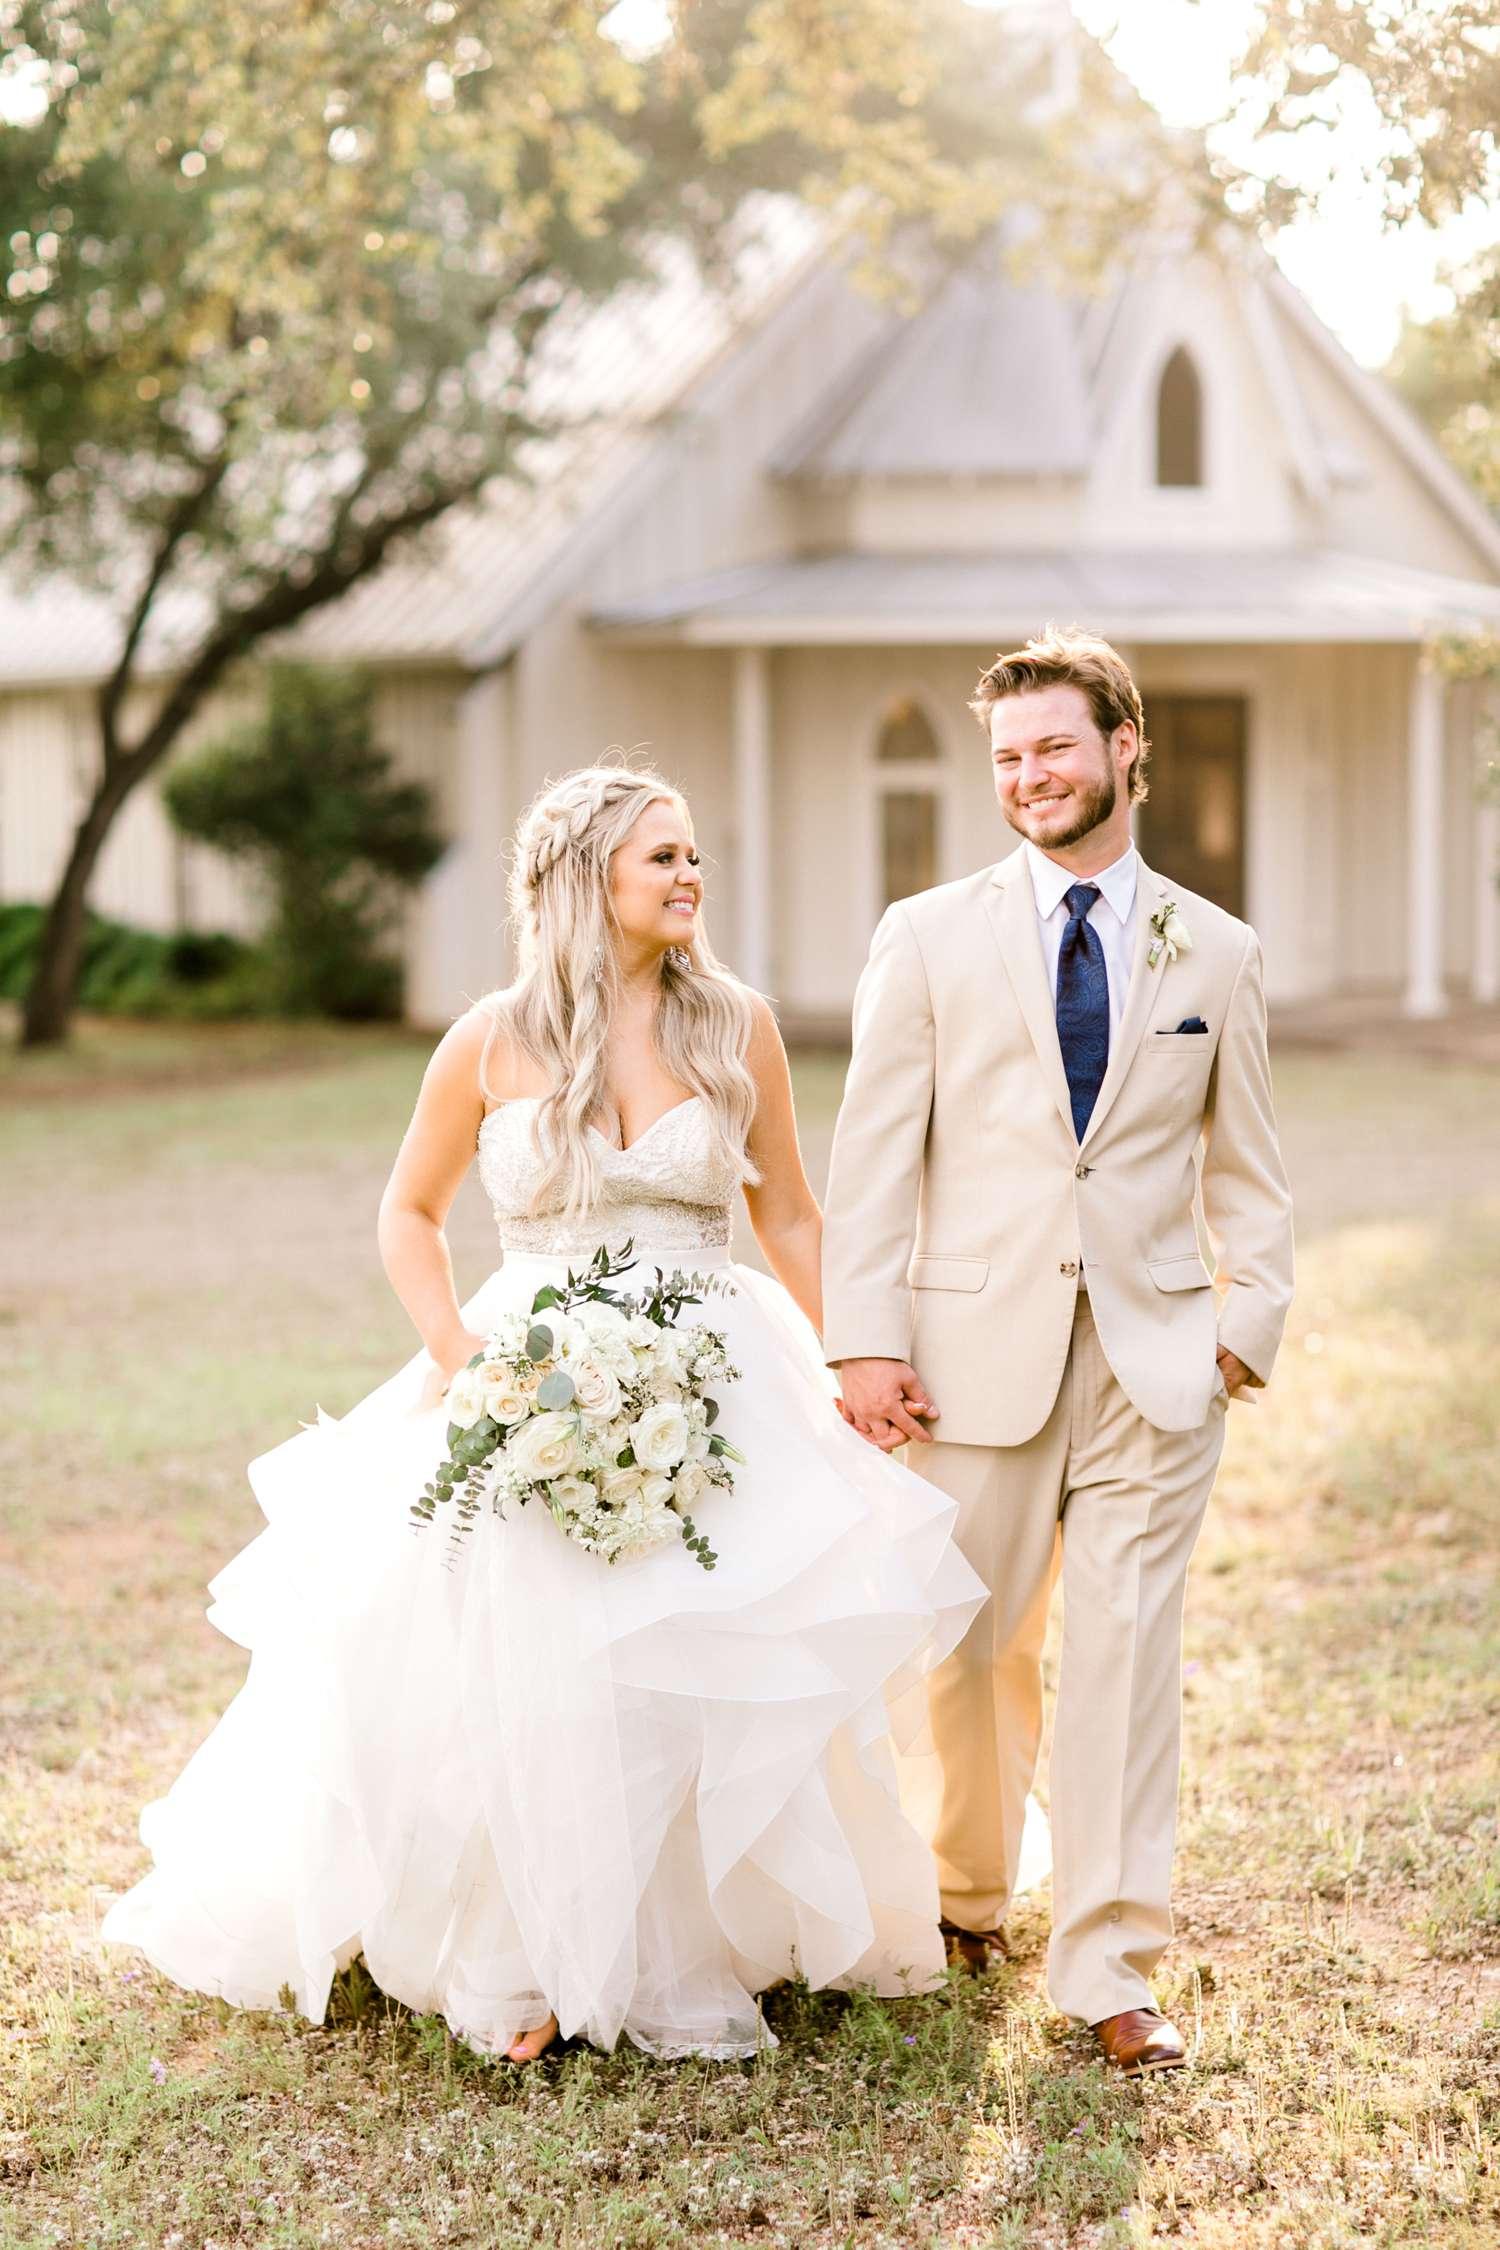 HAYLEE+JUSTIN+GREGORY+HERITAGE_HAUS_AUSTIN_TEXAS_WEDDING_0122.jpg